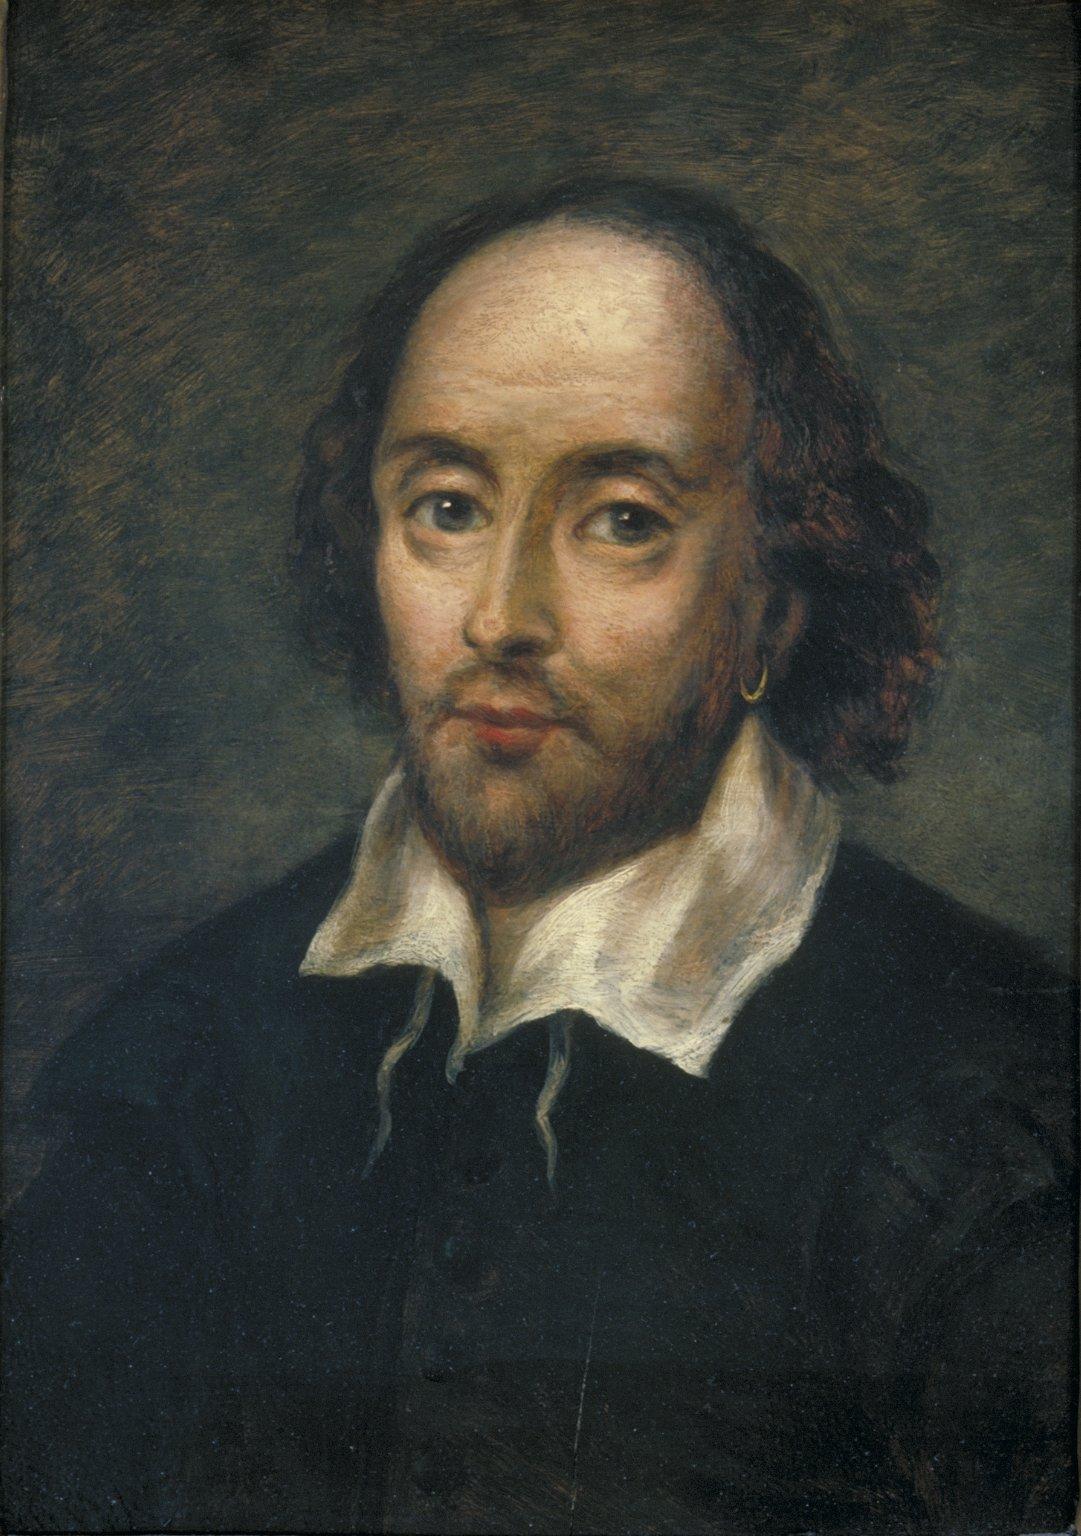 Palmer Portrait of Shakespeare